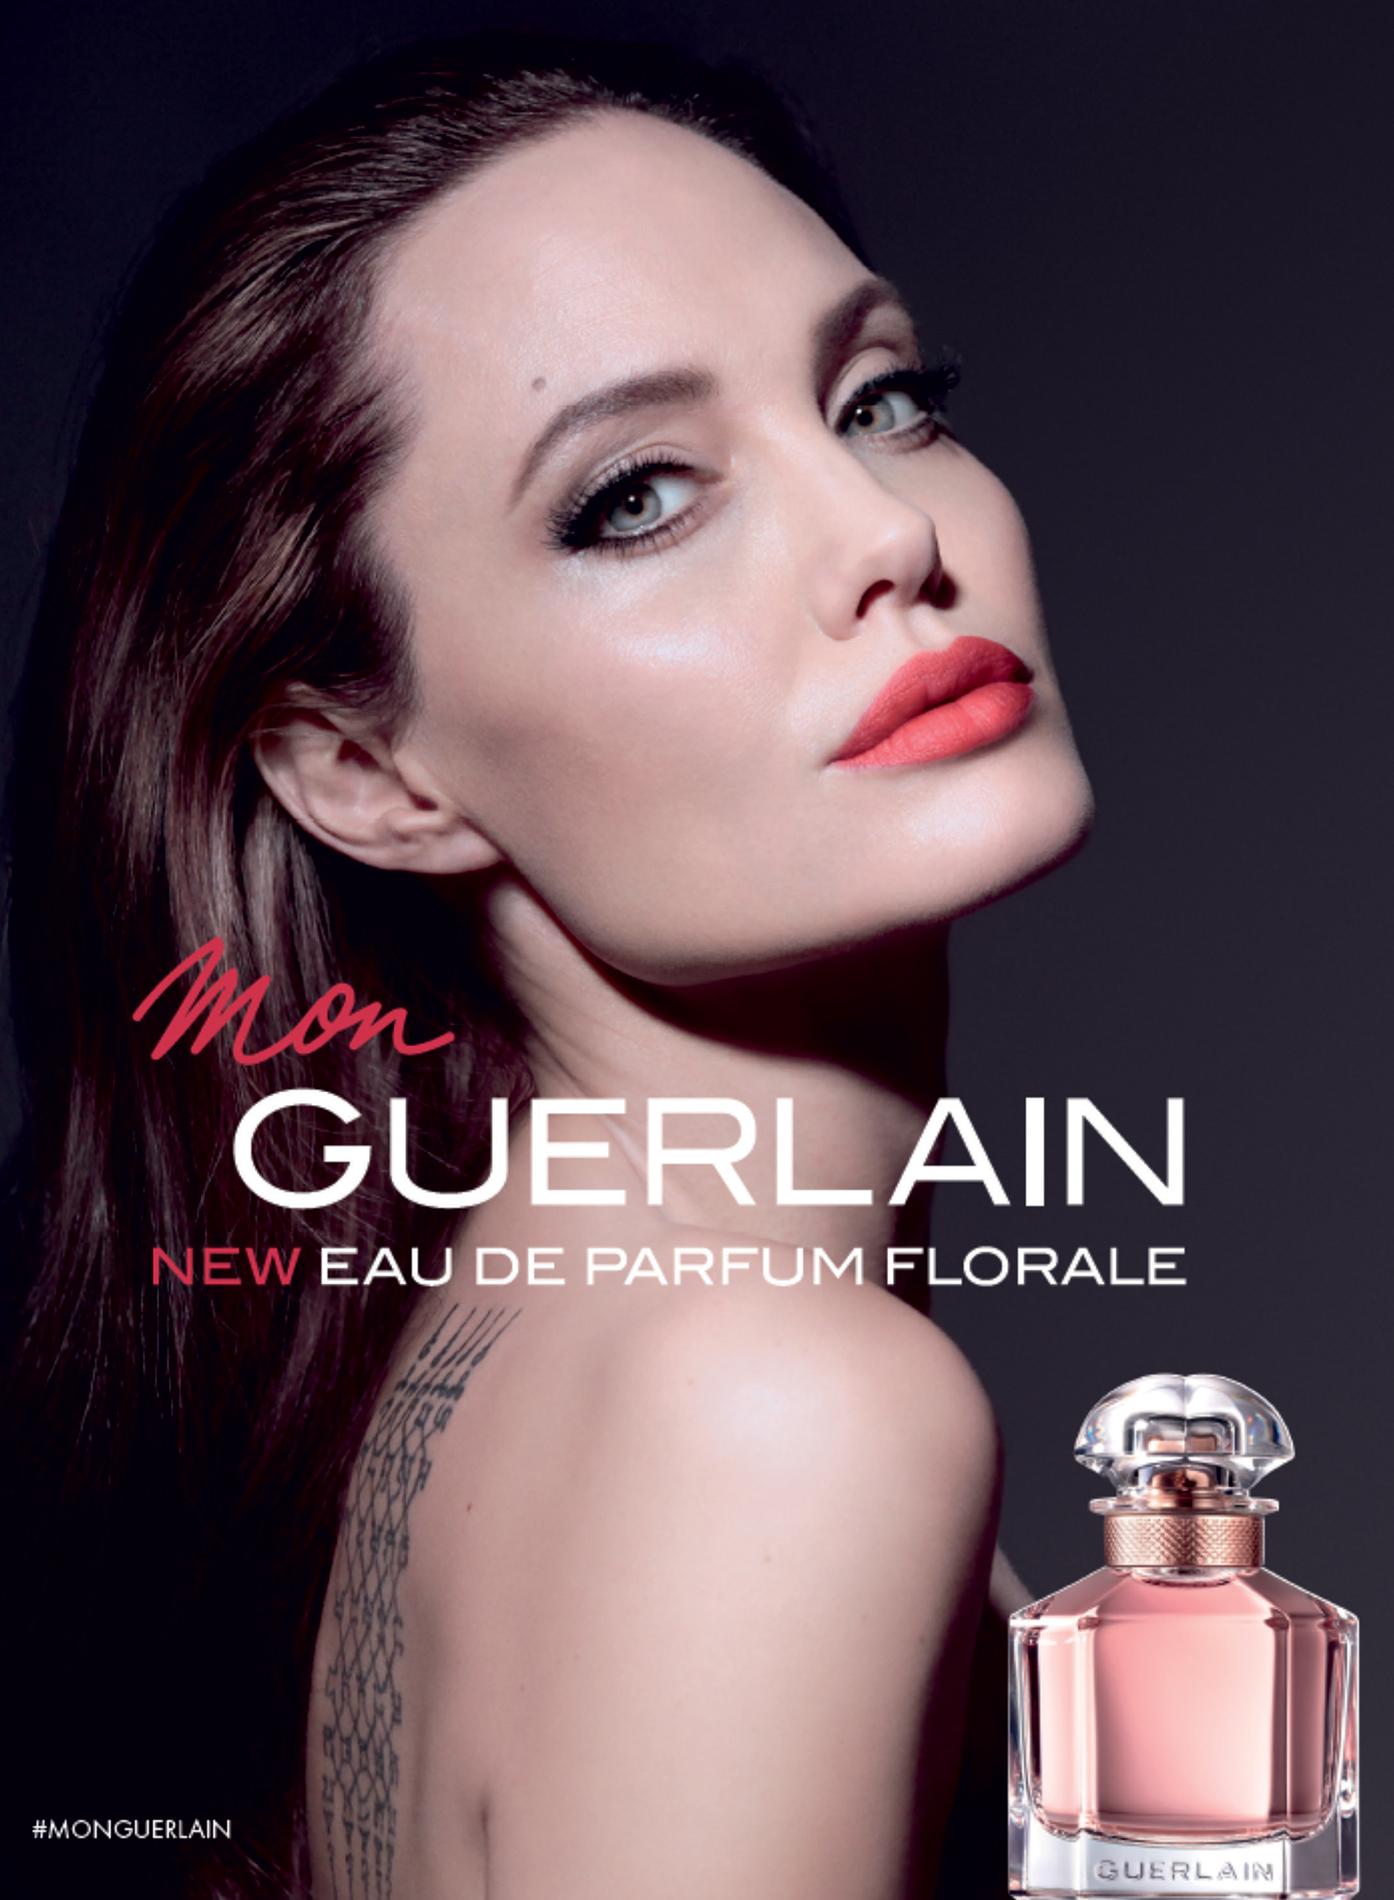 Mon Guerlain Florale Guerlain perfume - a new fragrance ...